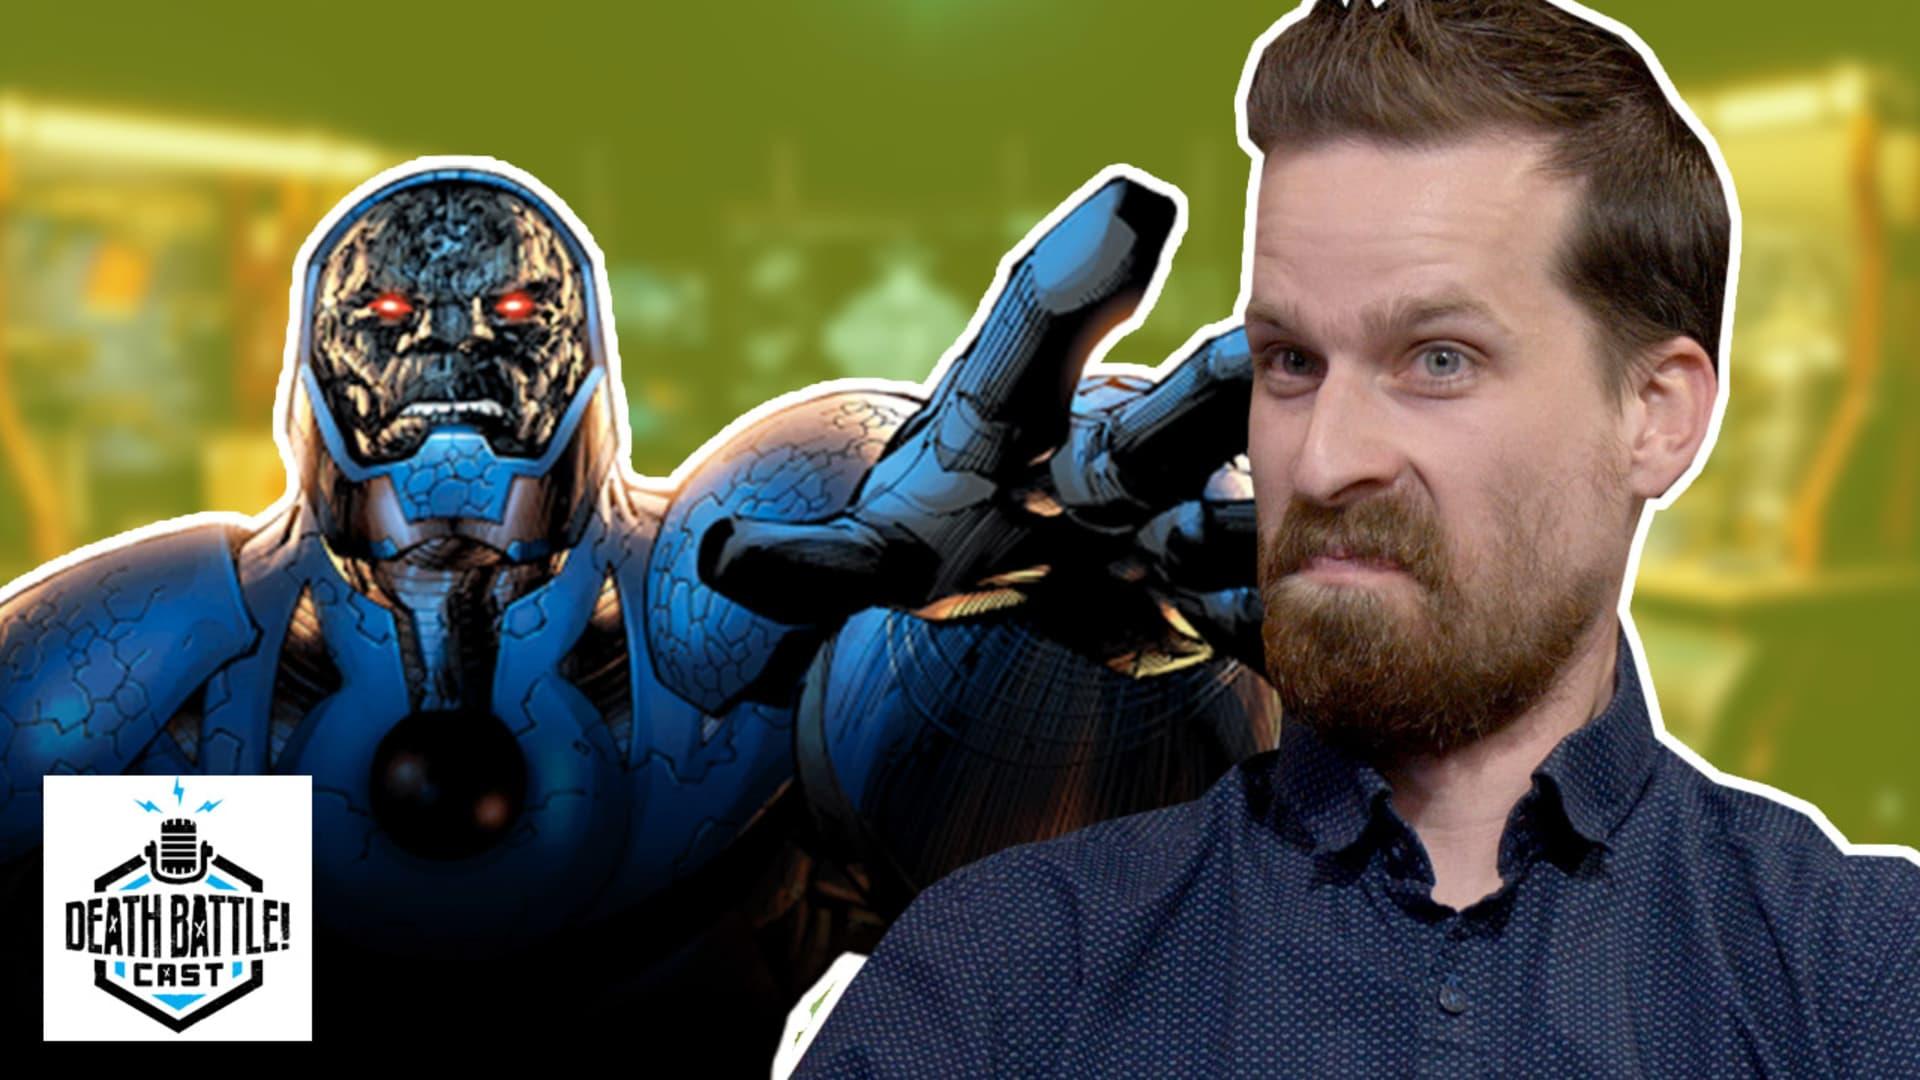 Thanos VS Darkseid Q&A - Rooster Teeth